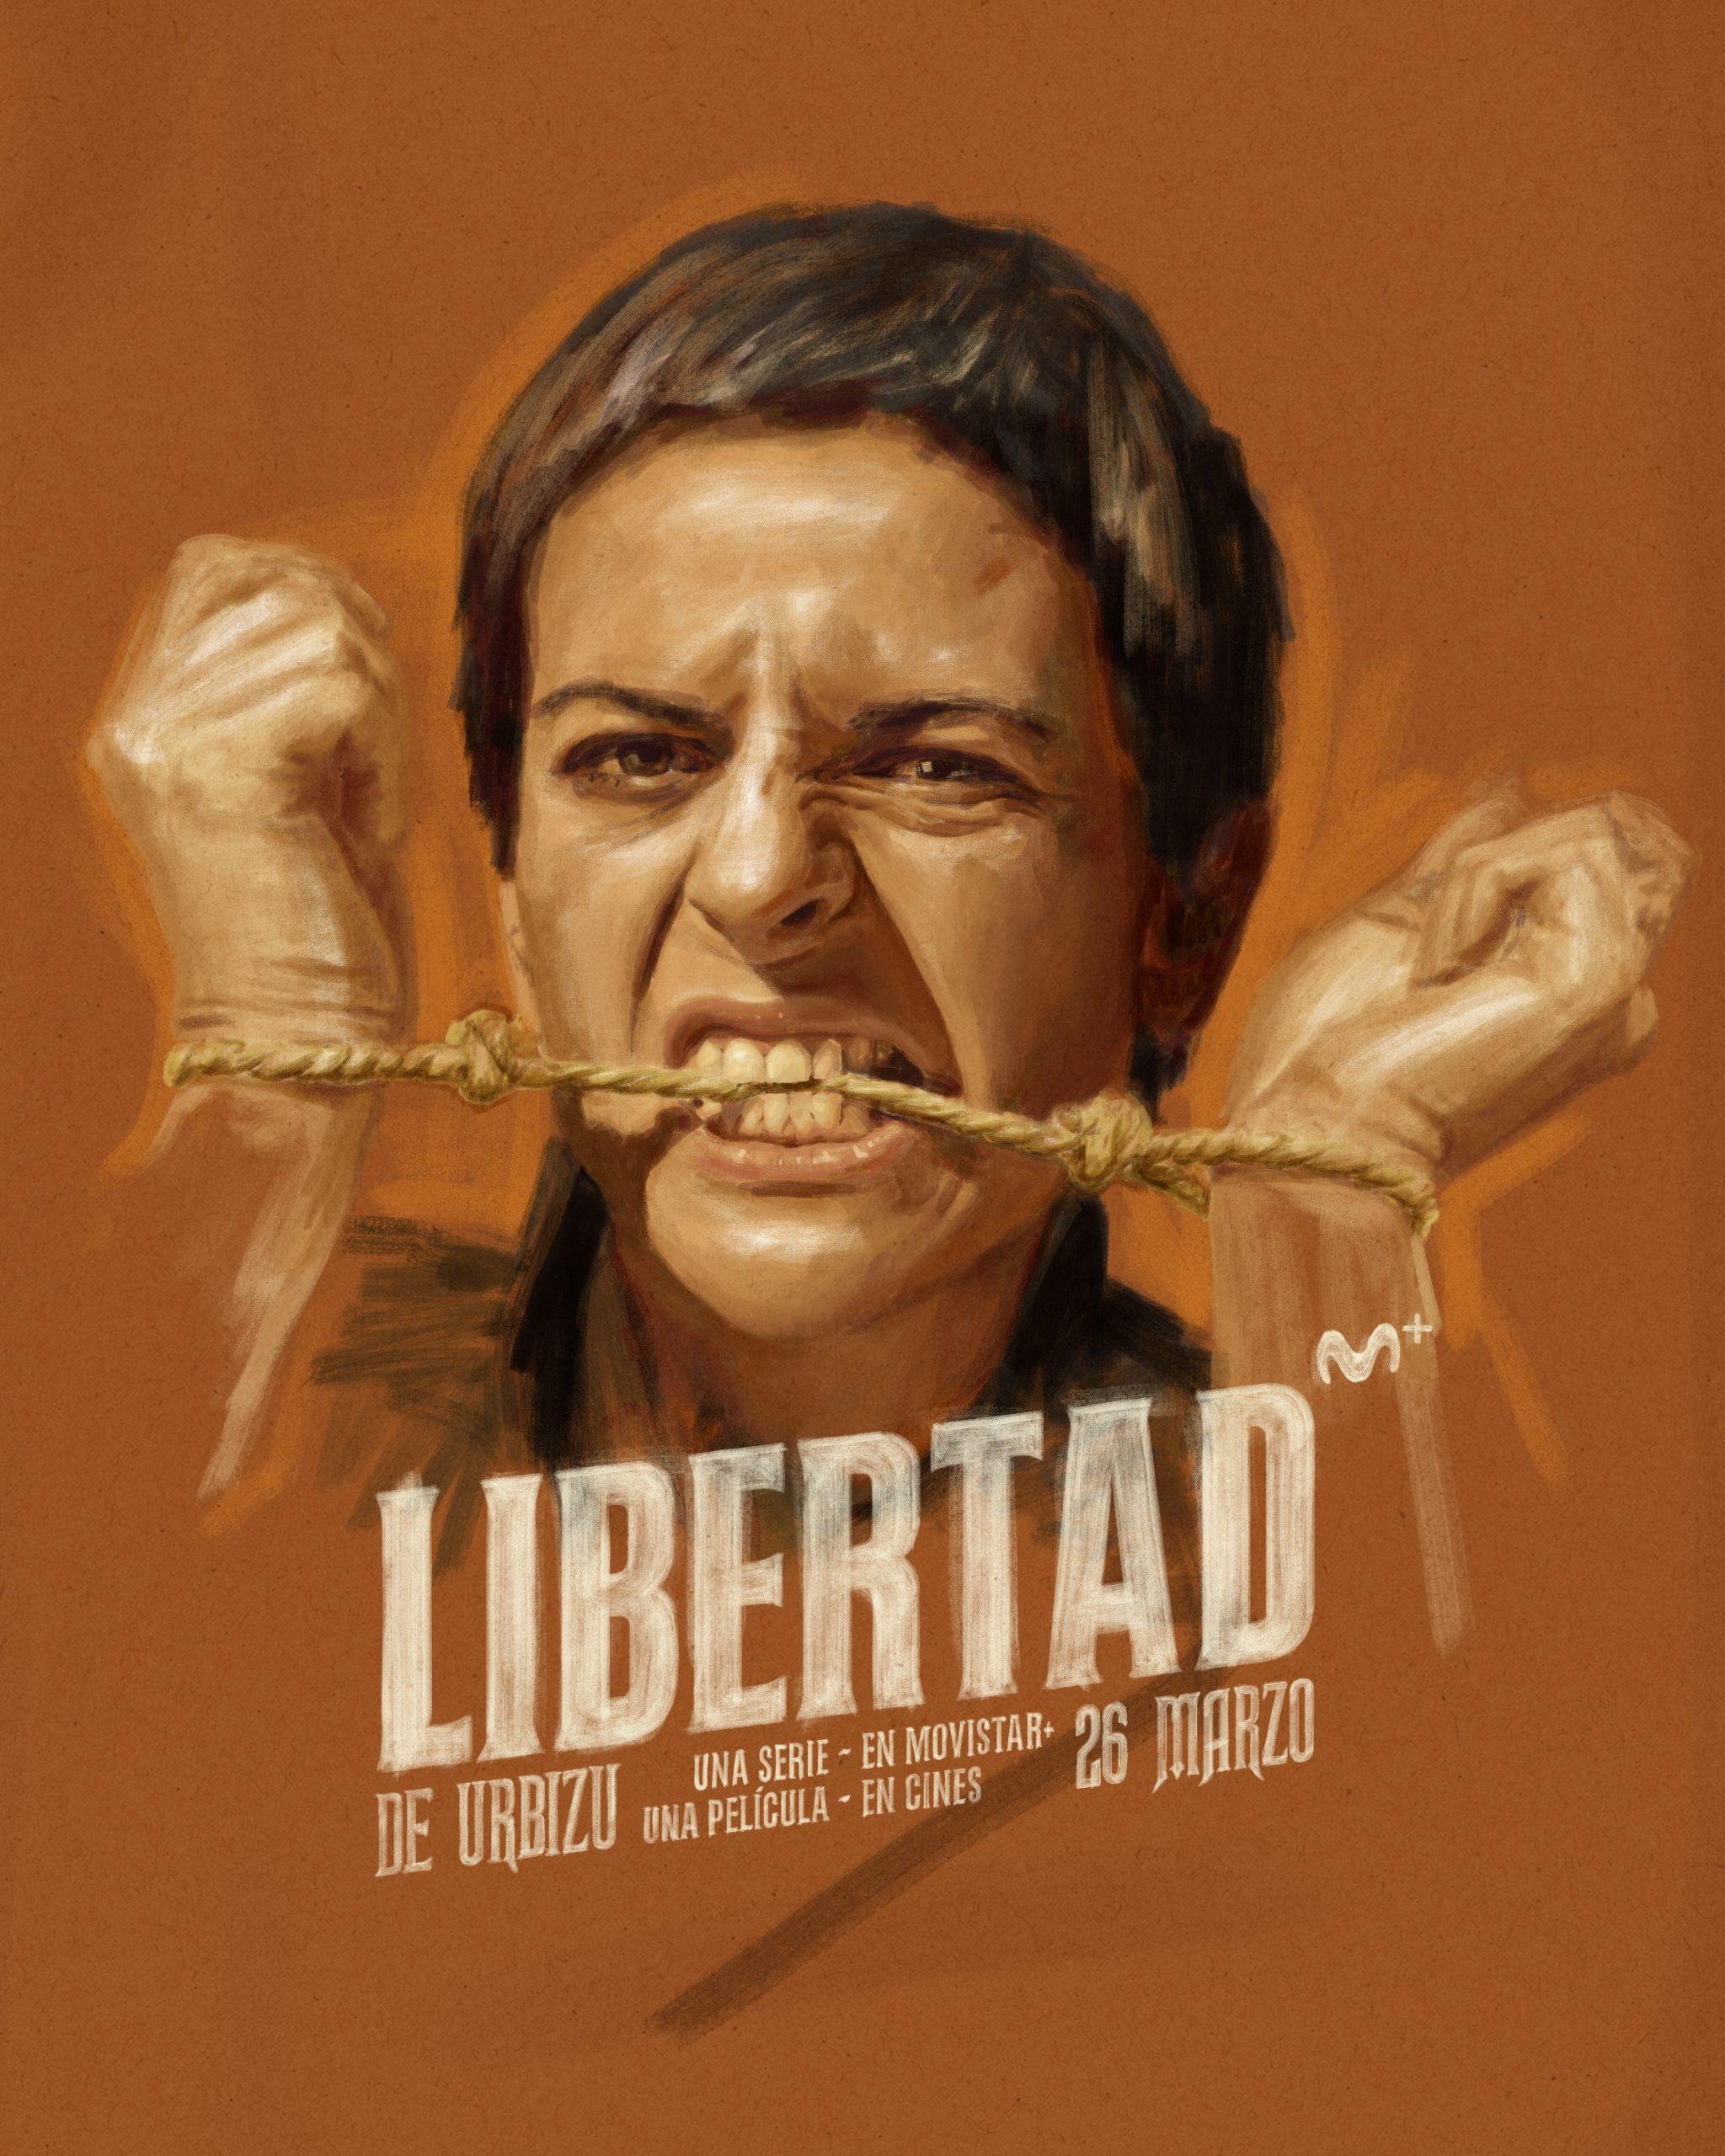 Cartel de 'Libertad', de Enrique Urbizu.